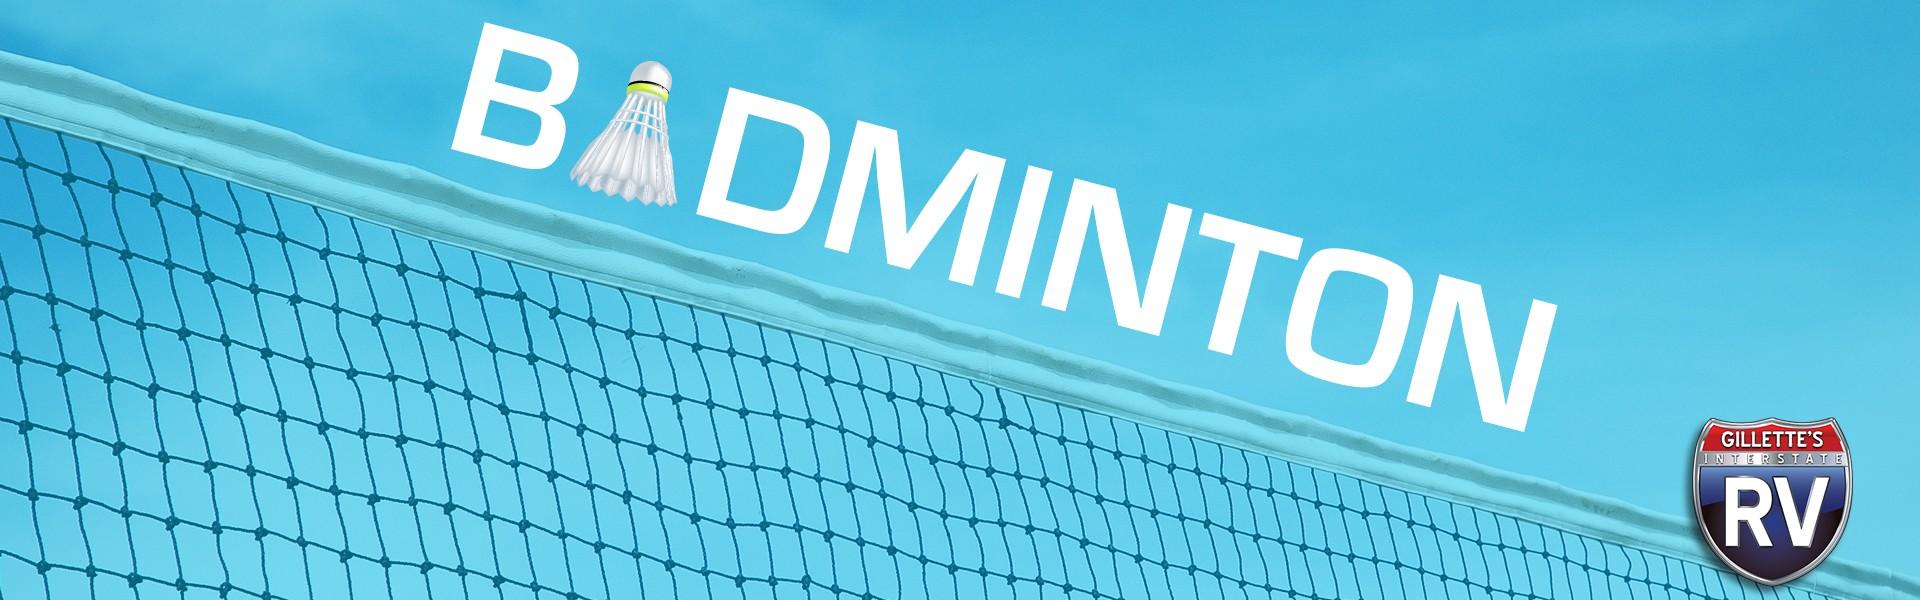 Badminton - Birdie flying over during game